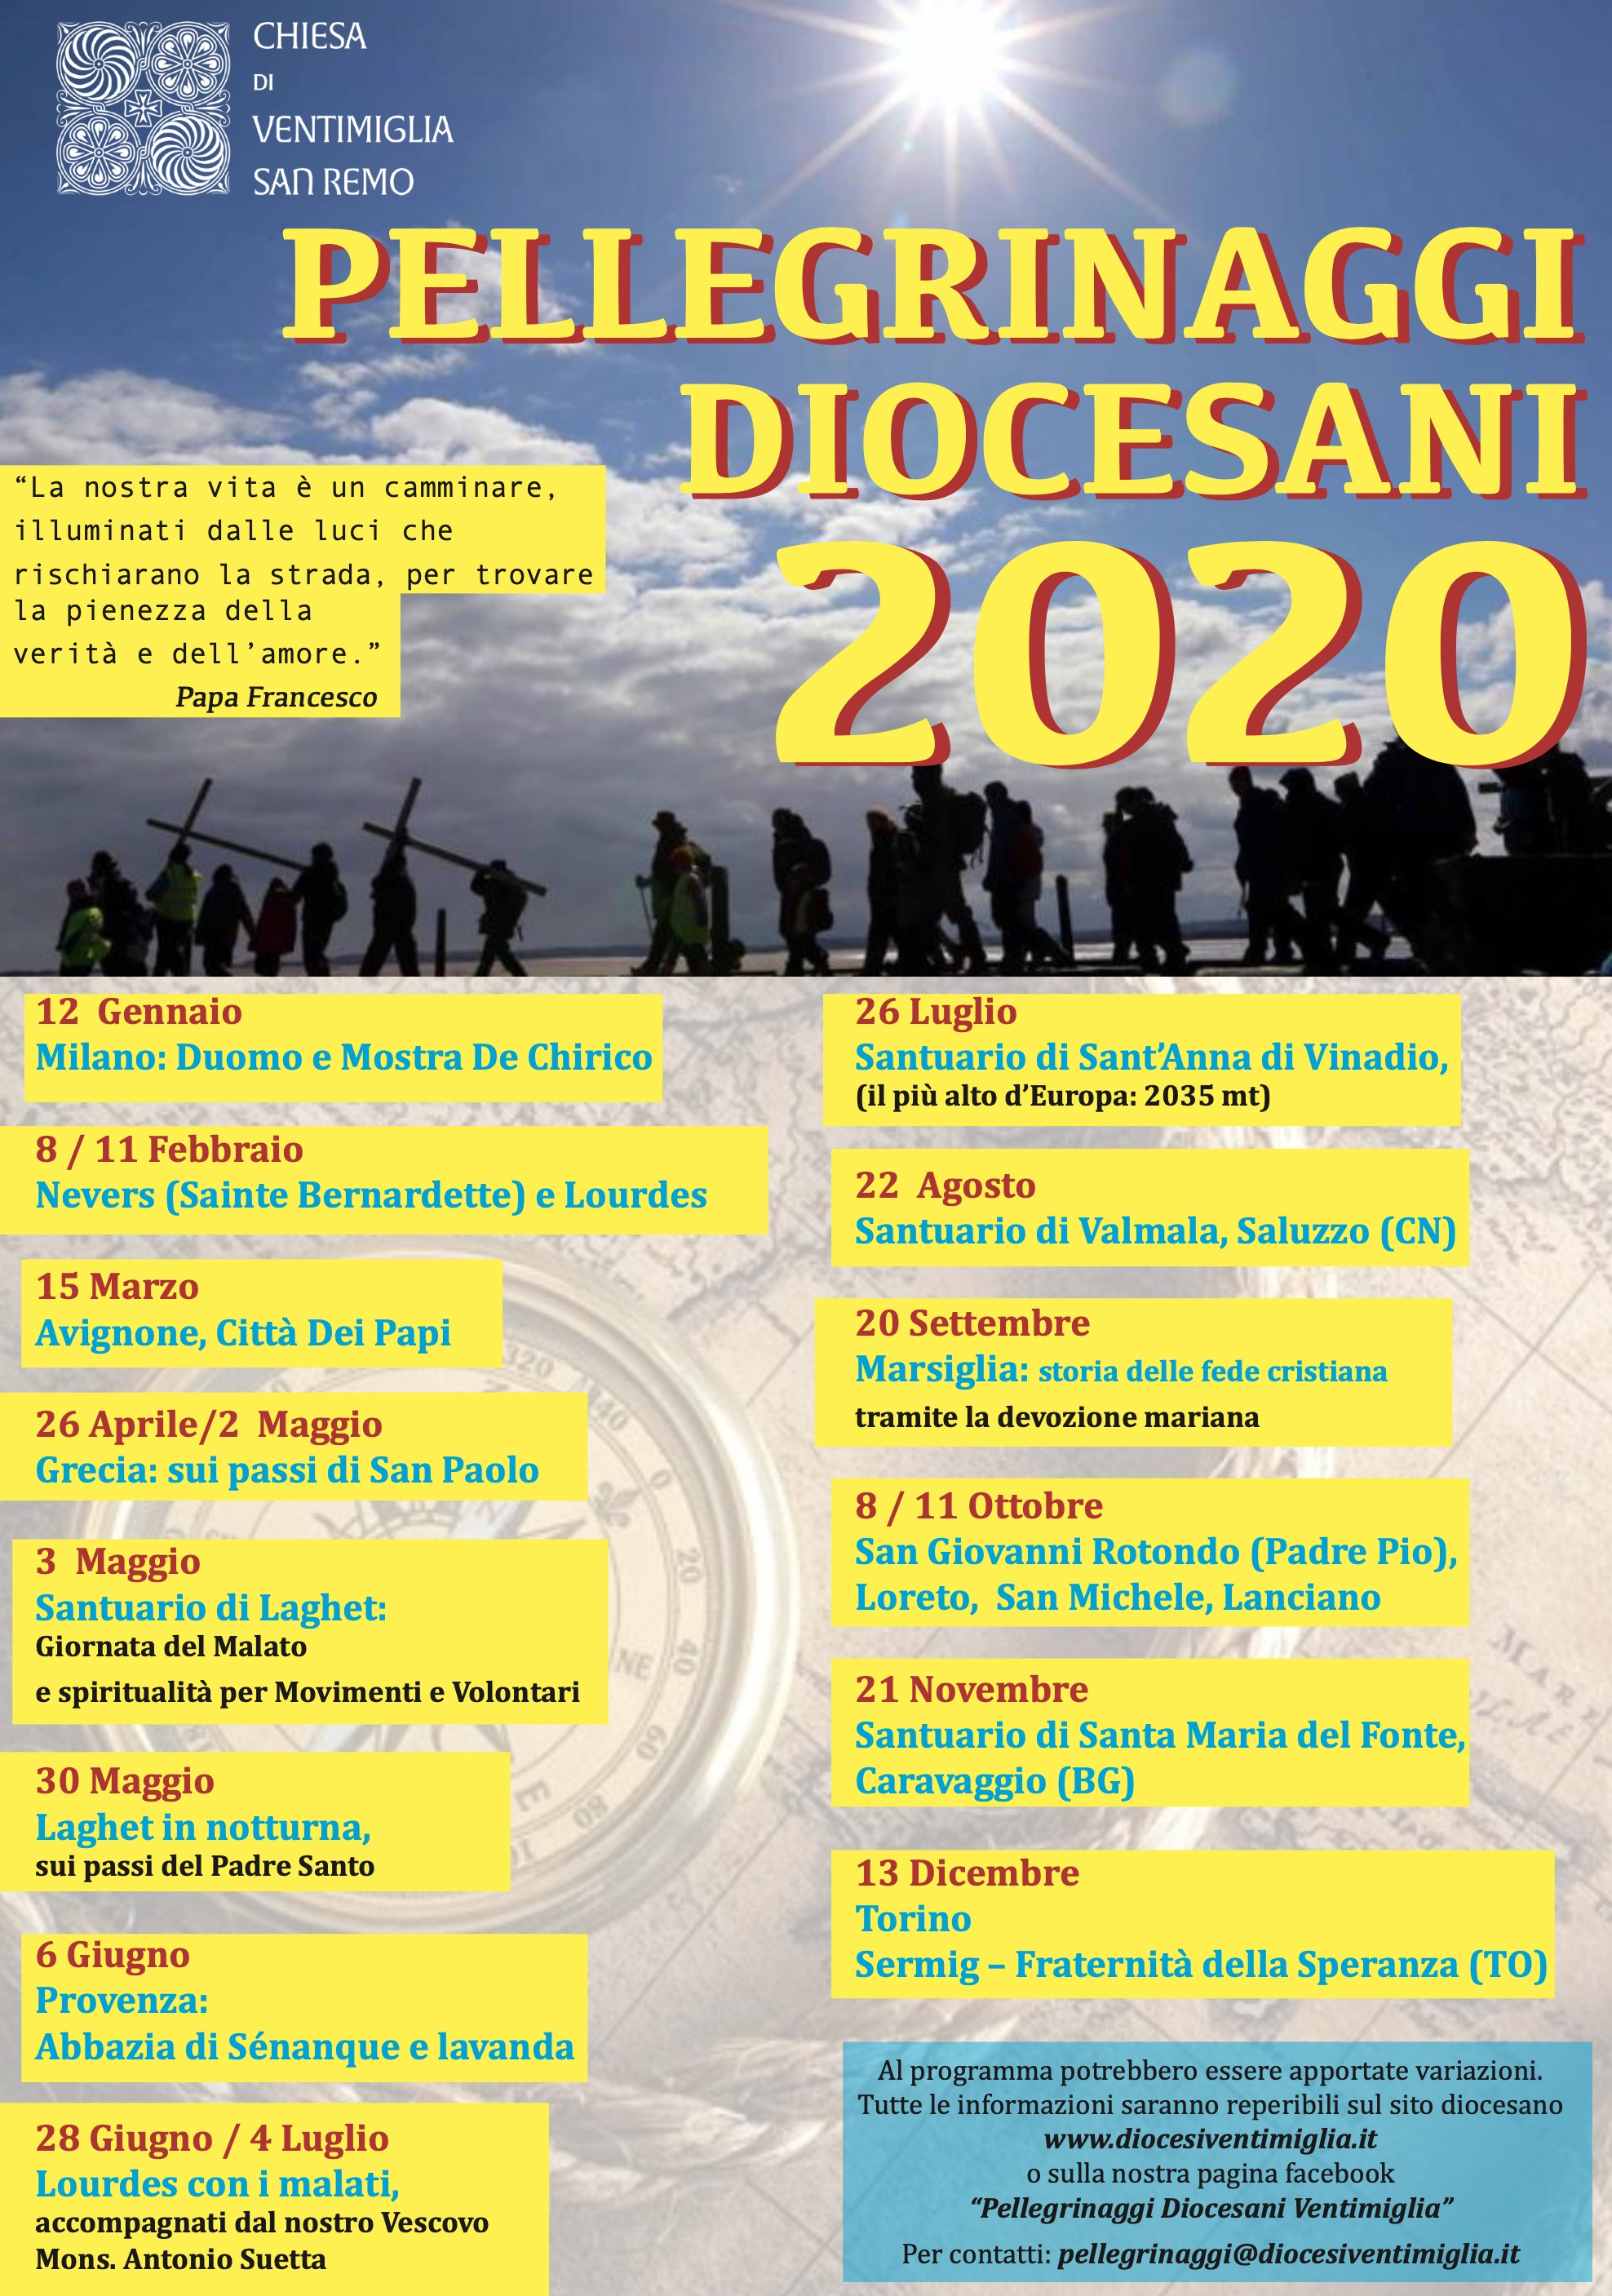 Pellegrinaggi 2020